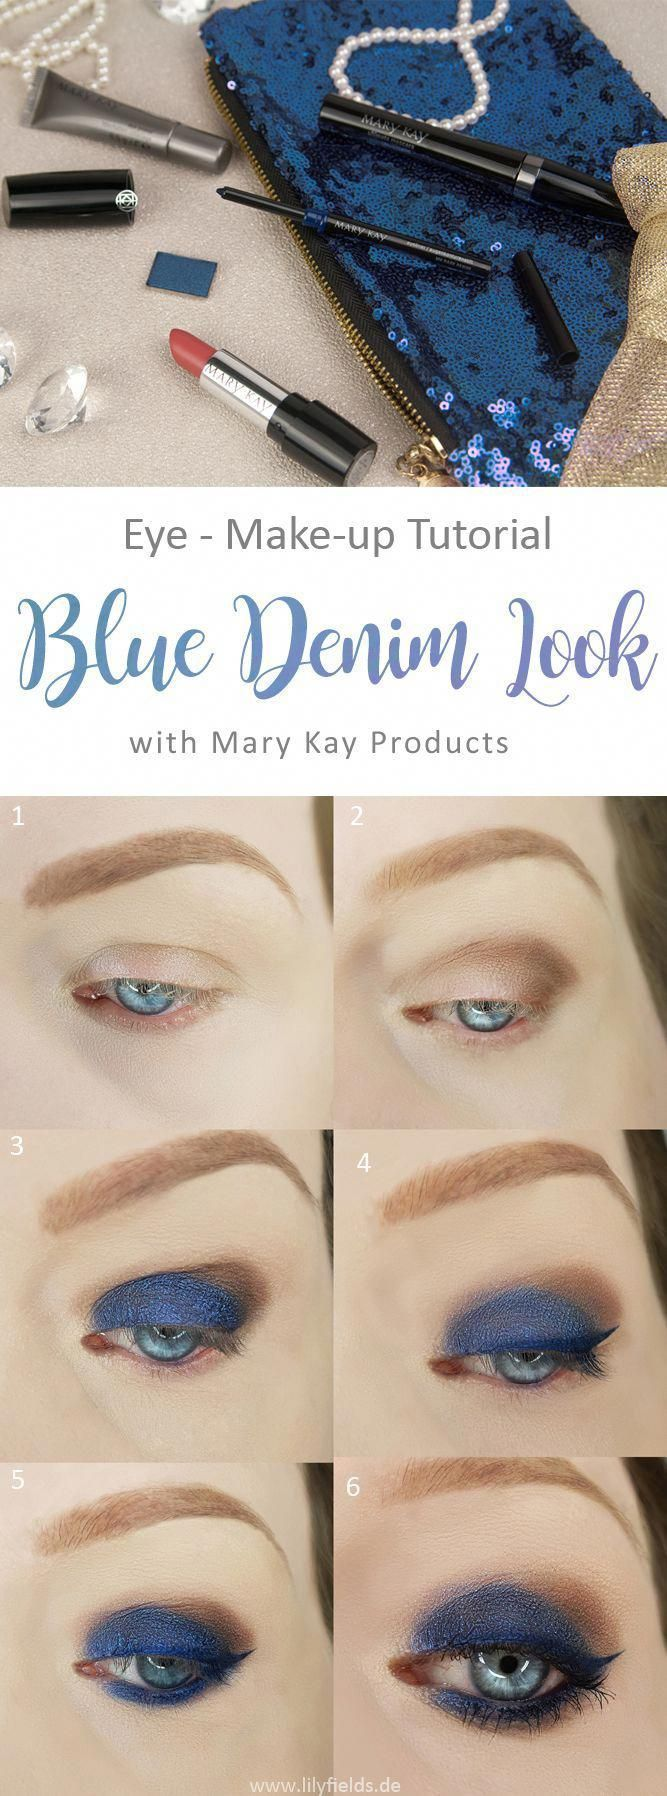 Augen Make-up Tutorial in sechs Schritten. Schritt-für-Schritt-Anleitung für B …   – augenmakeup